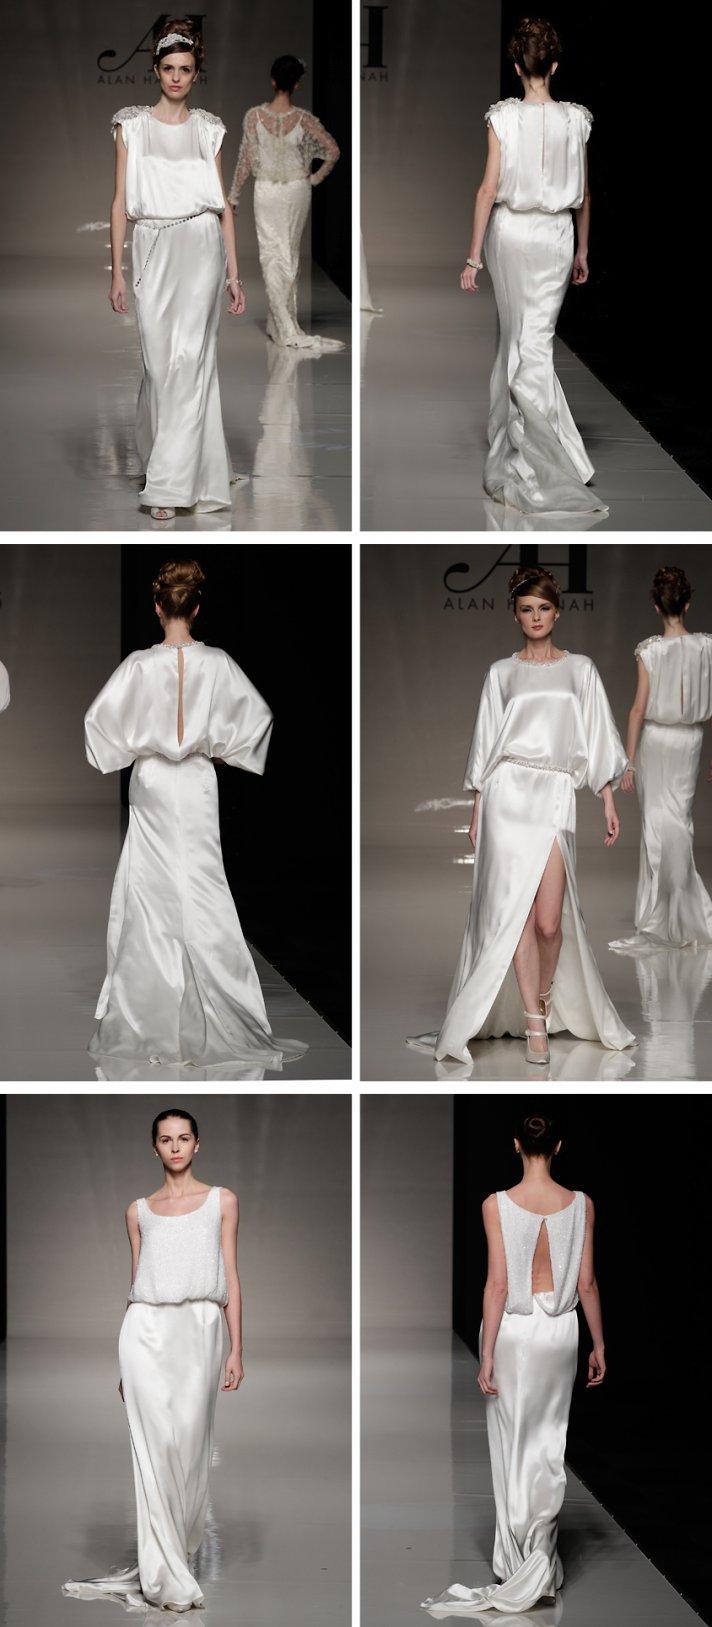 2013 wedding dresses bridal gown inspiration white gallery london blouson bridal trend